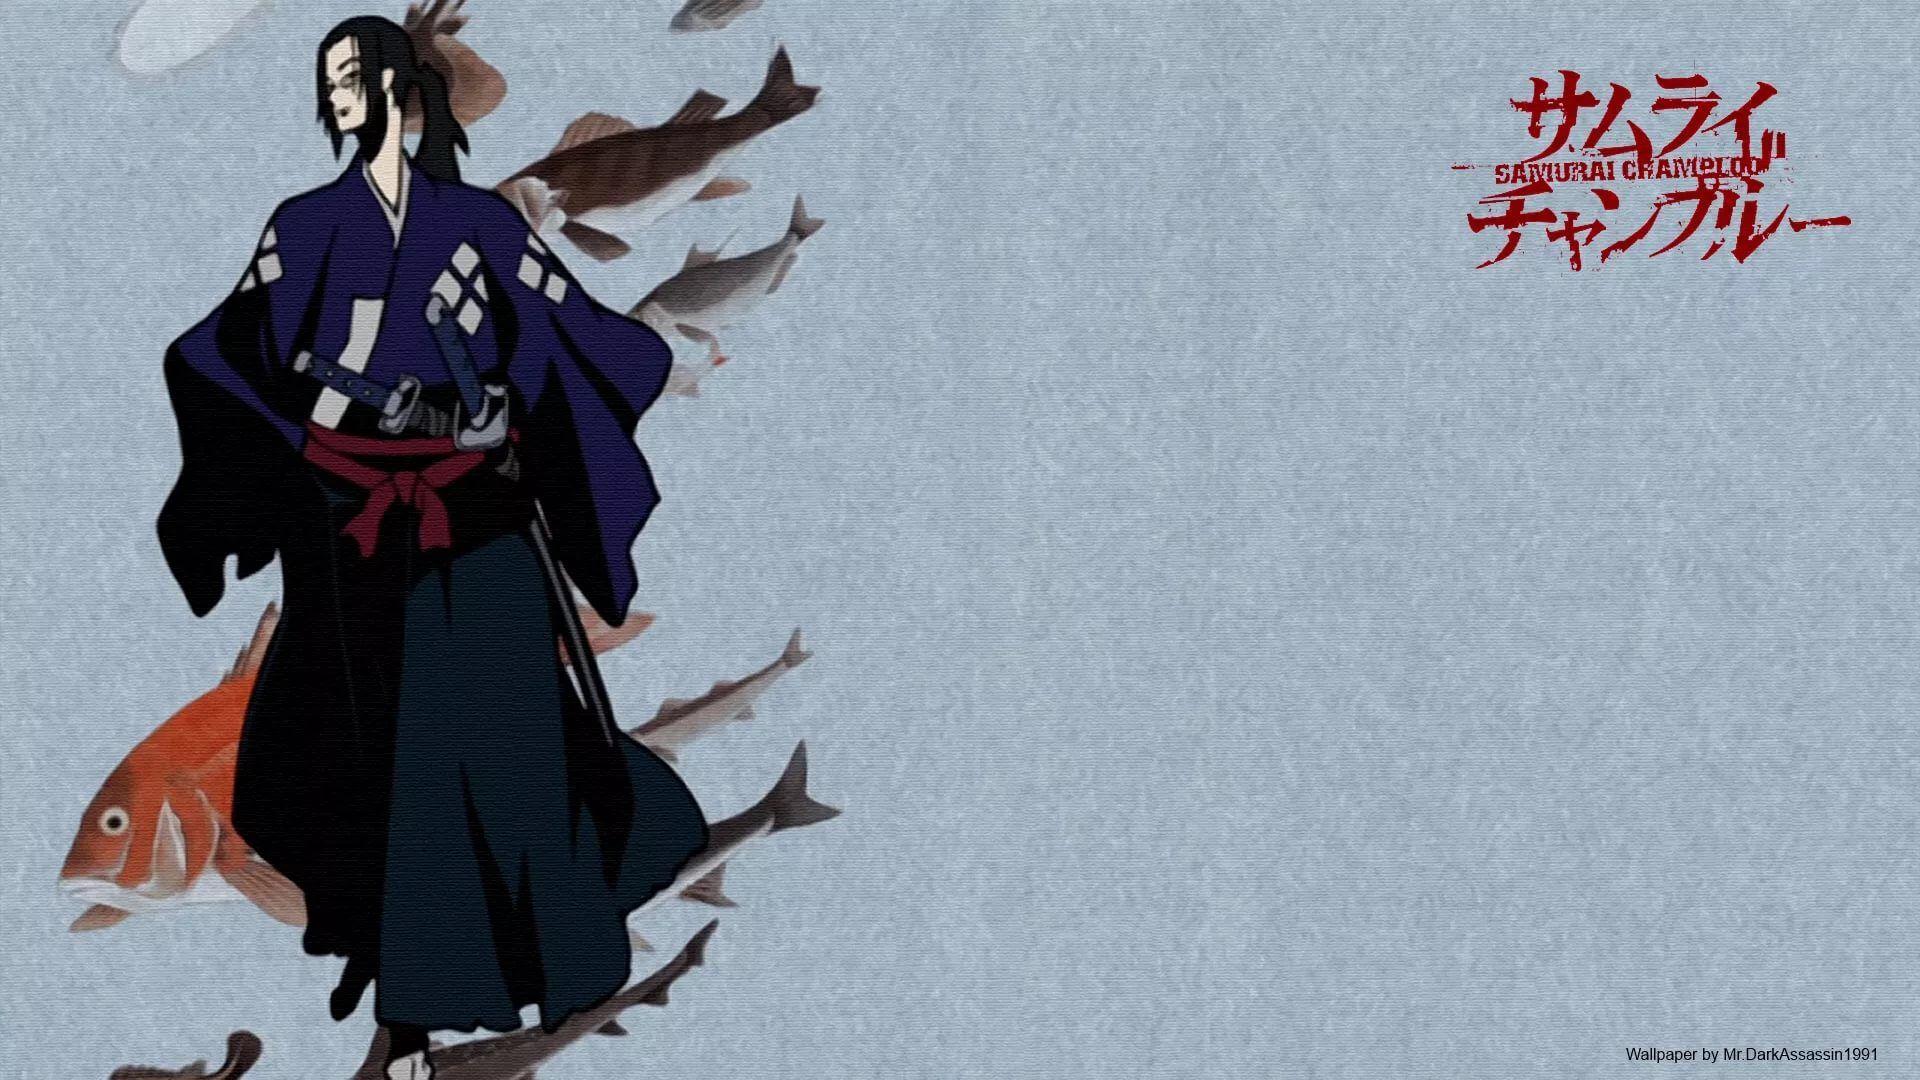 Jin Samurai Champloo Wallpapers   Top Jin Samurai Champloo 1920x1080